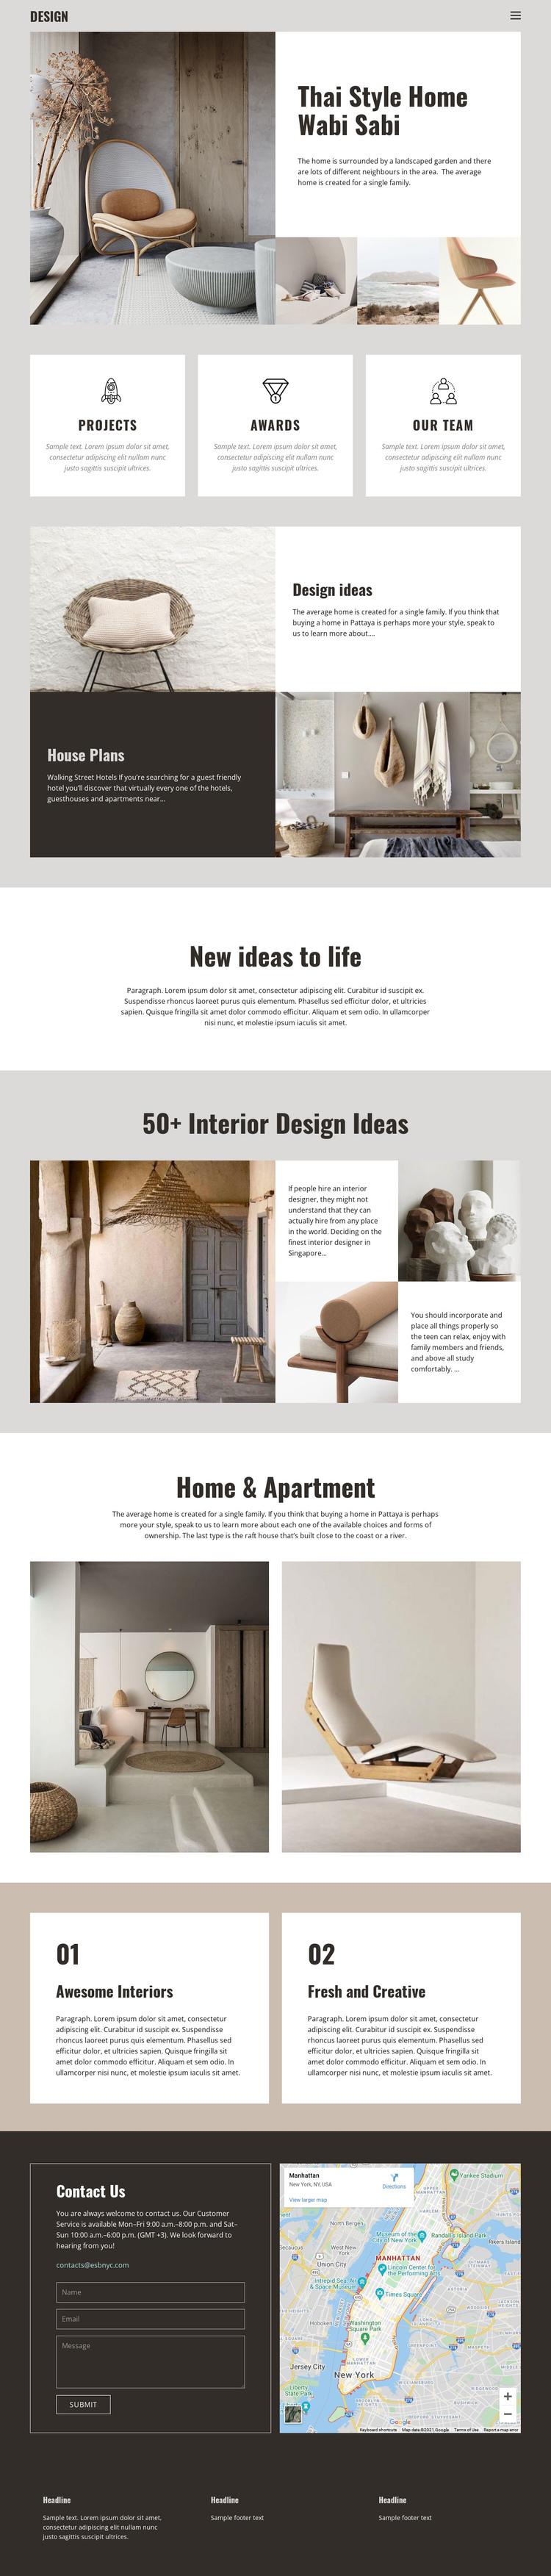 Thai style for home design Website Builder Software